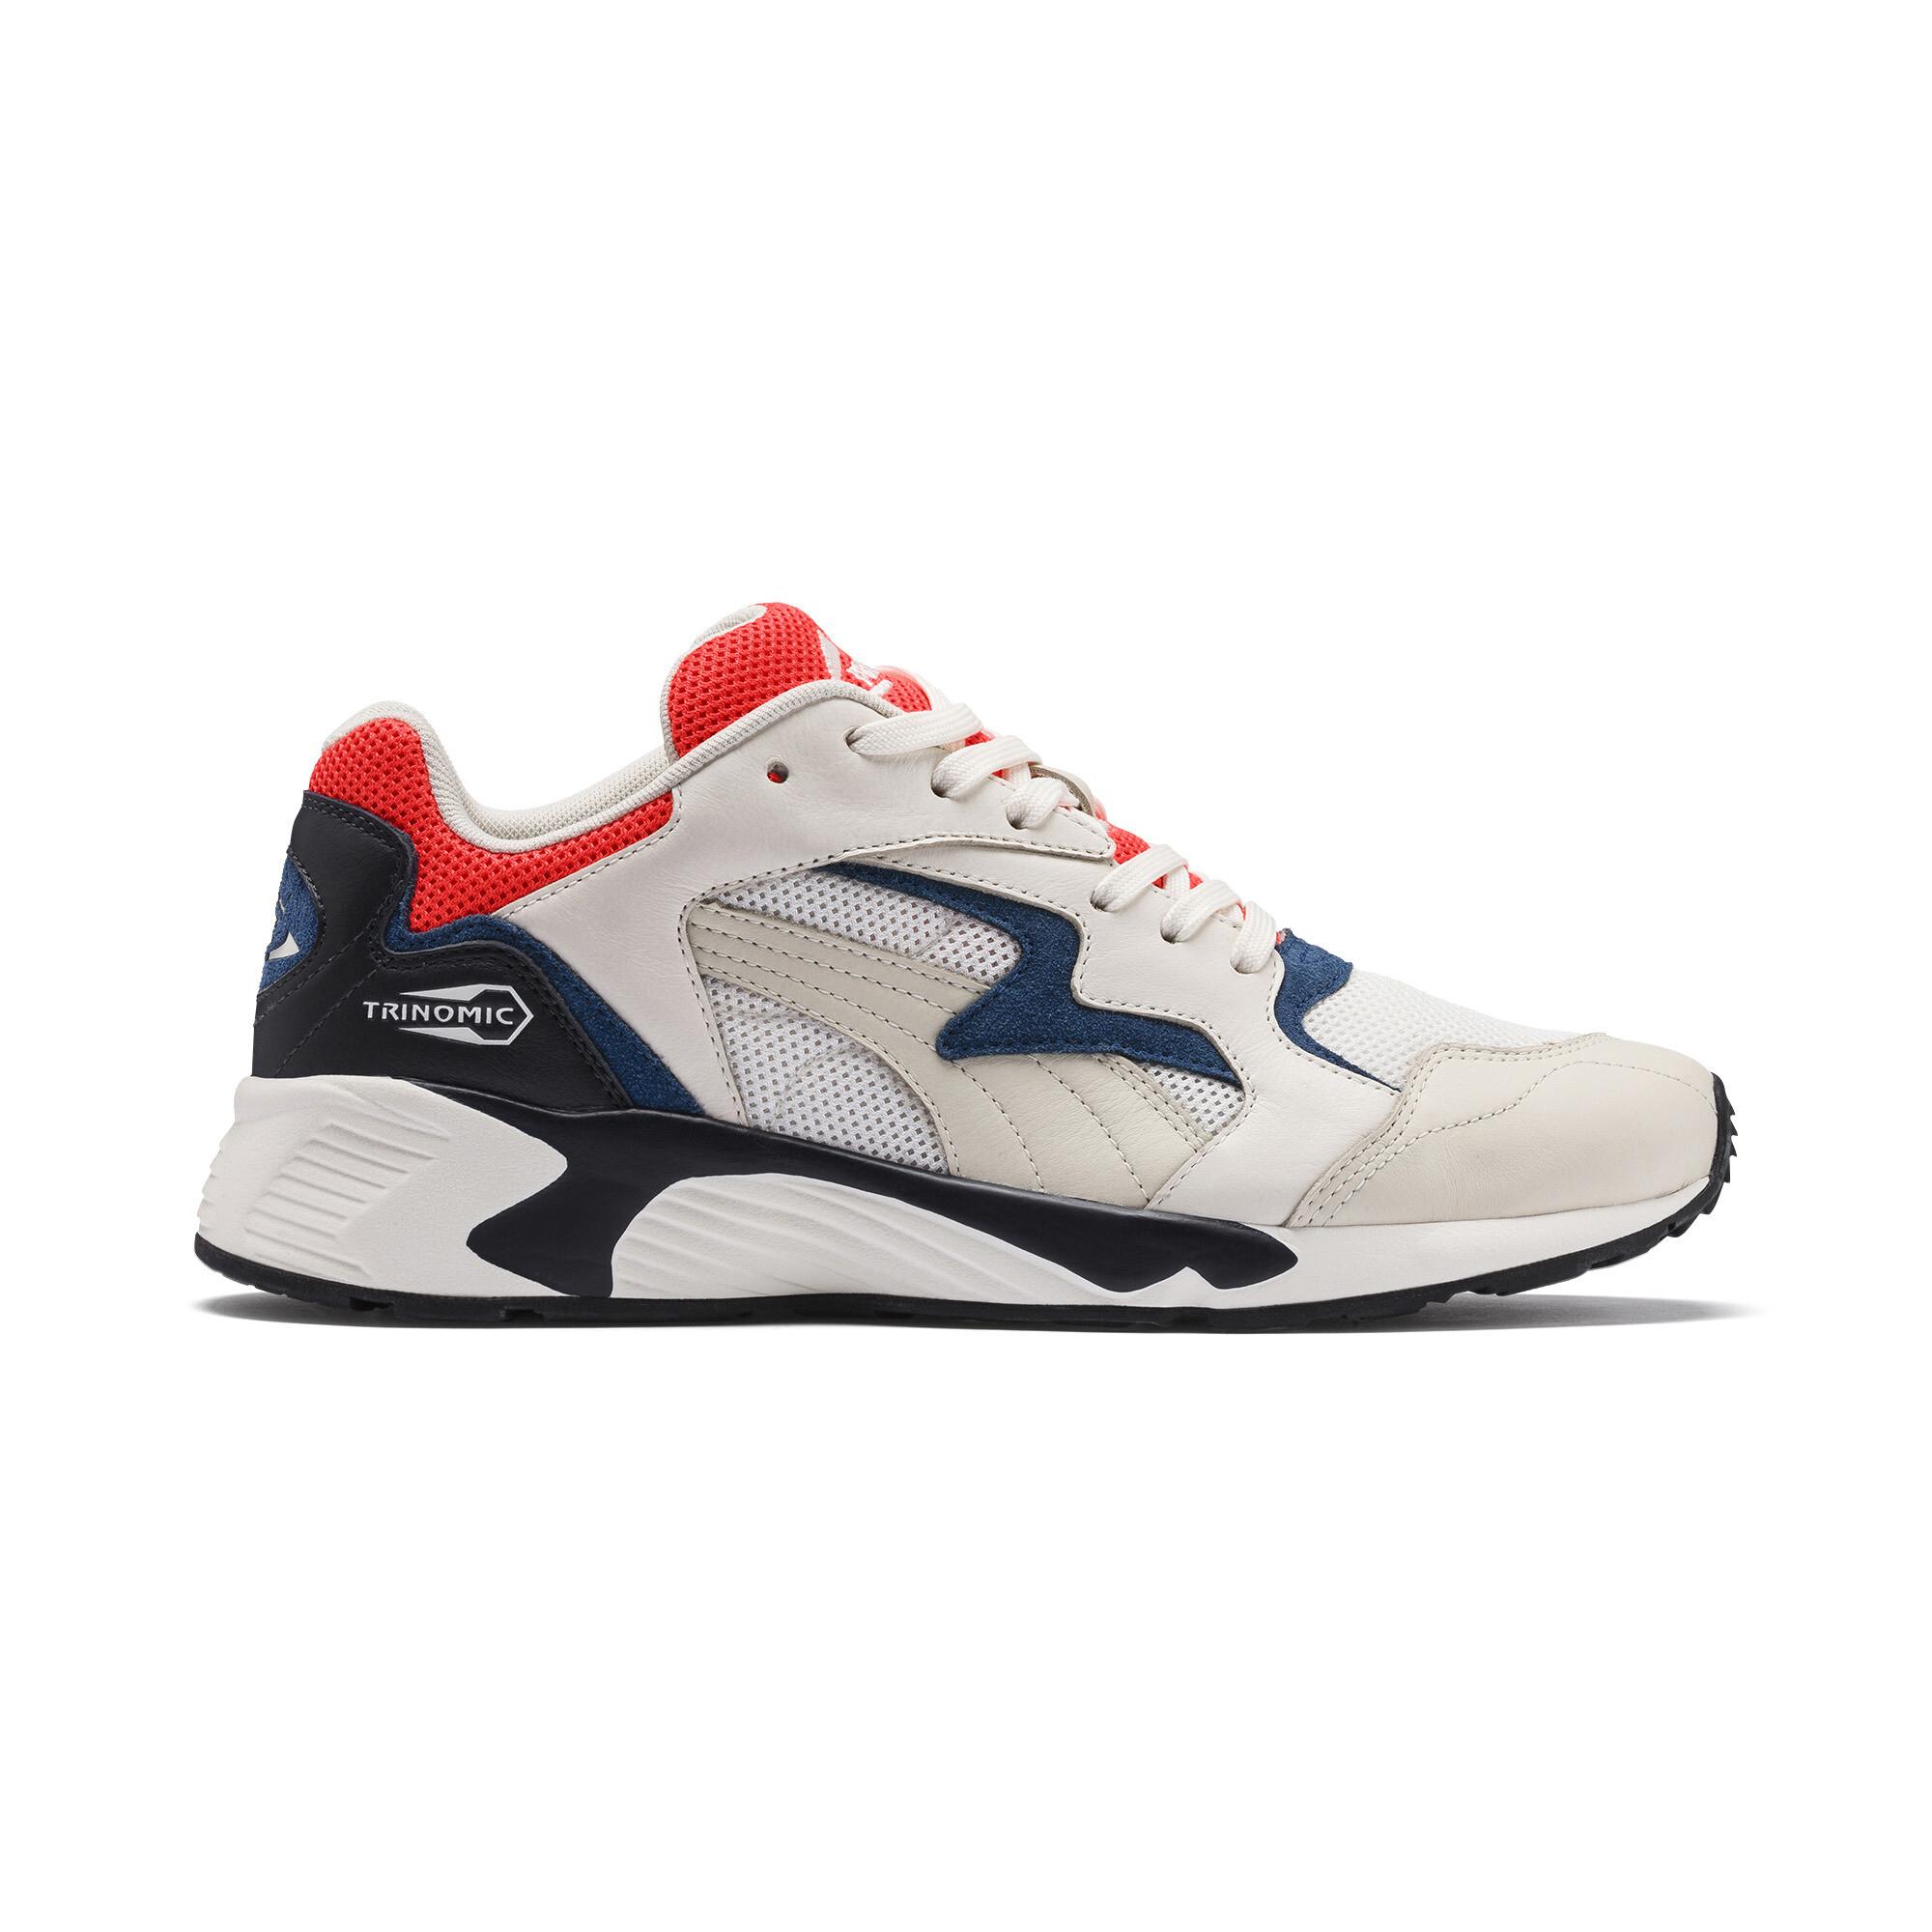 PUMA-Prevail-Classic-Sneakers-Unisex-Shoe thumbnail 6